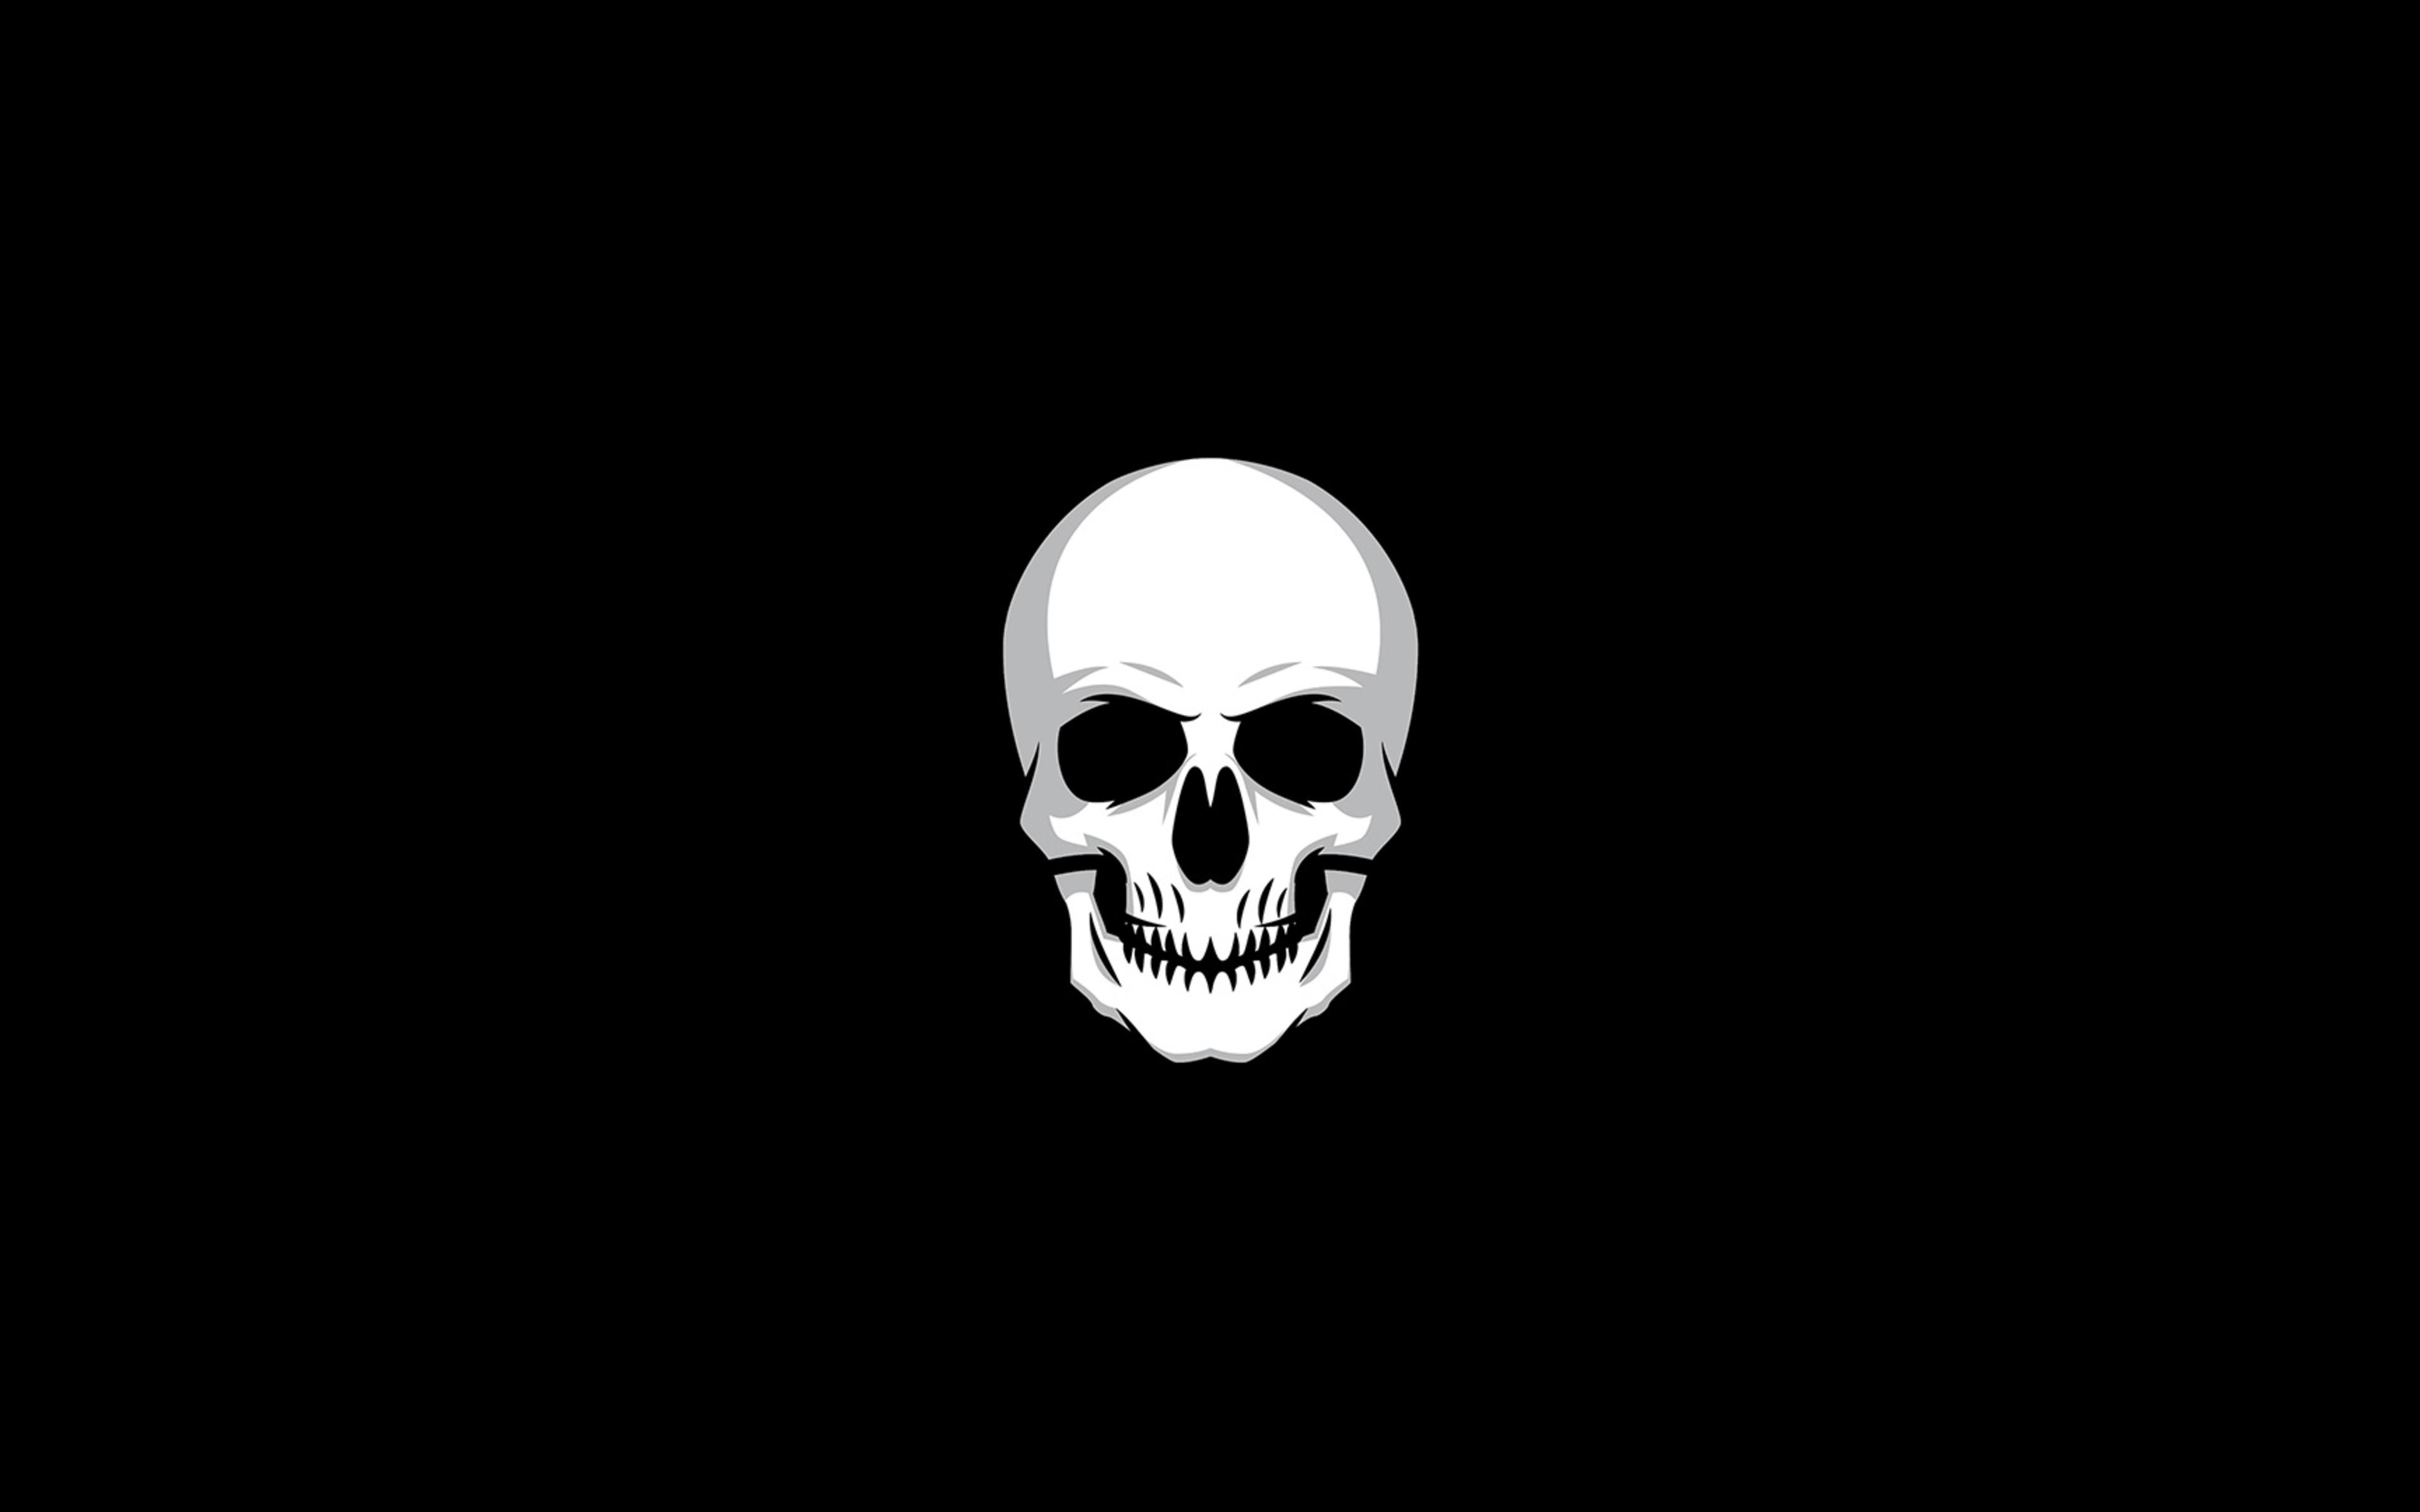 skull-logo-uz.jpg